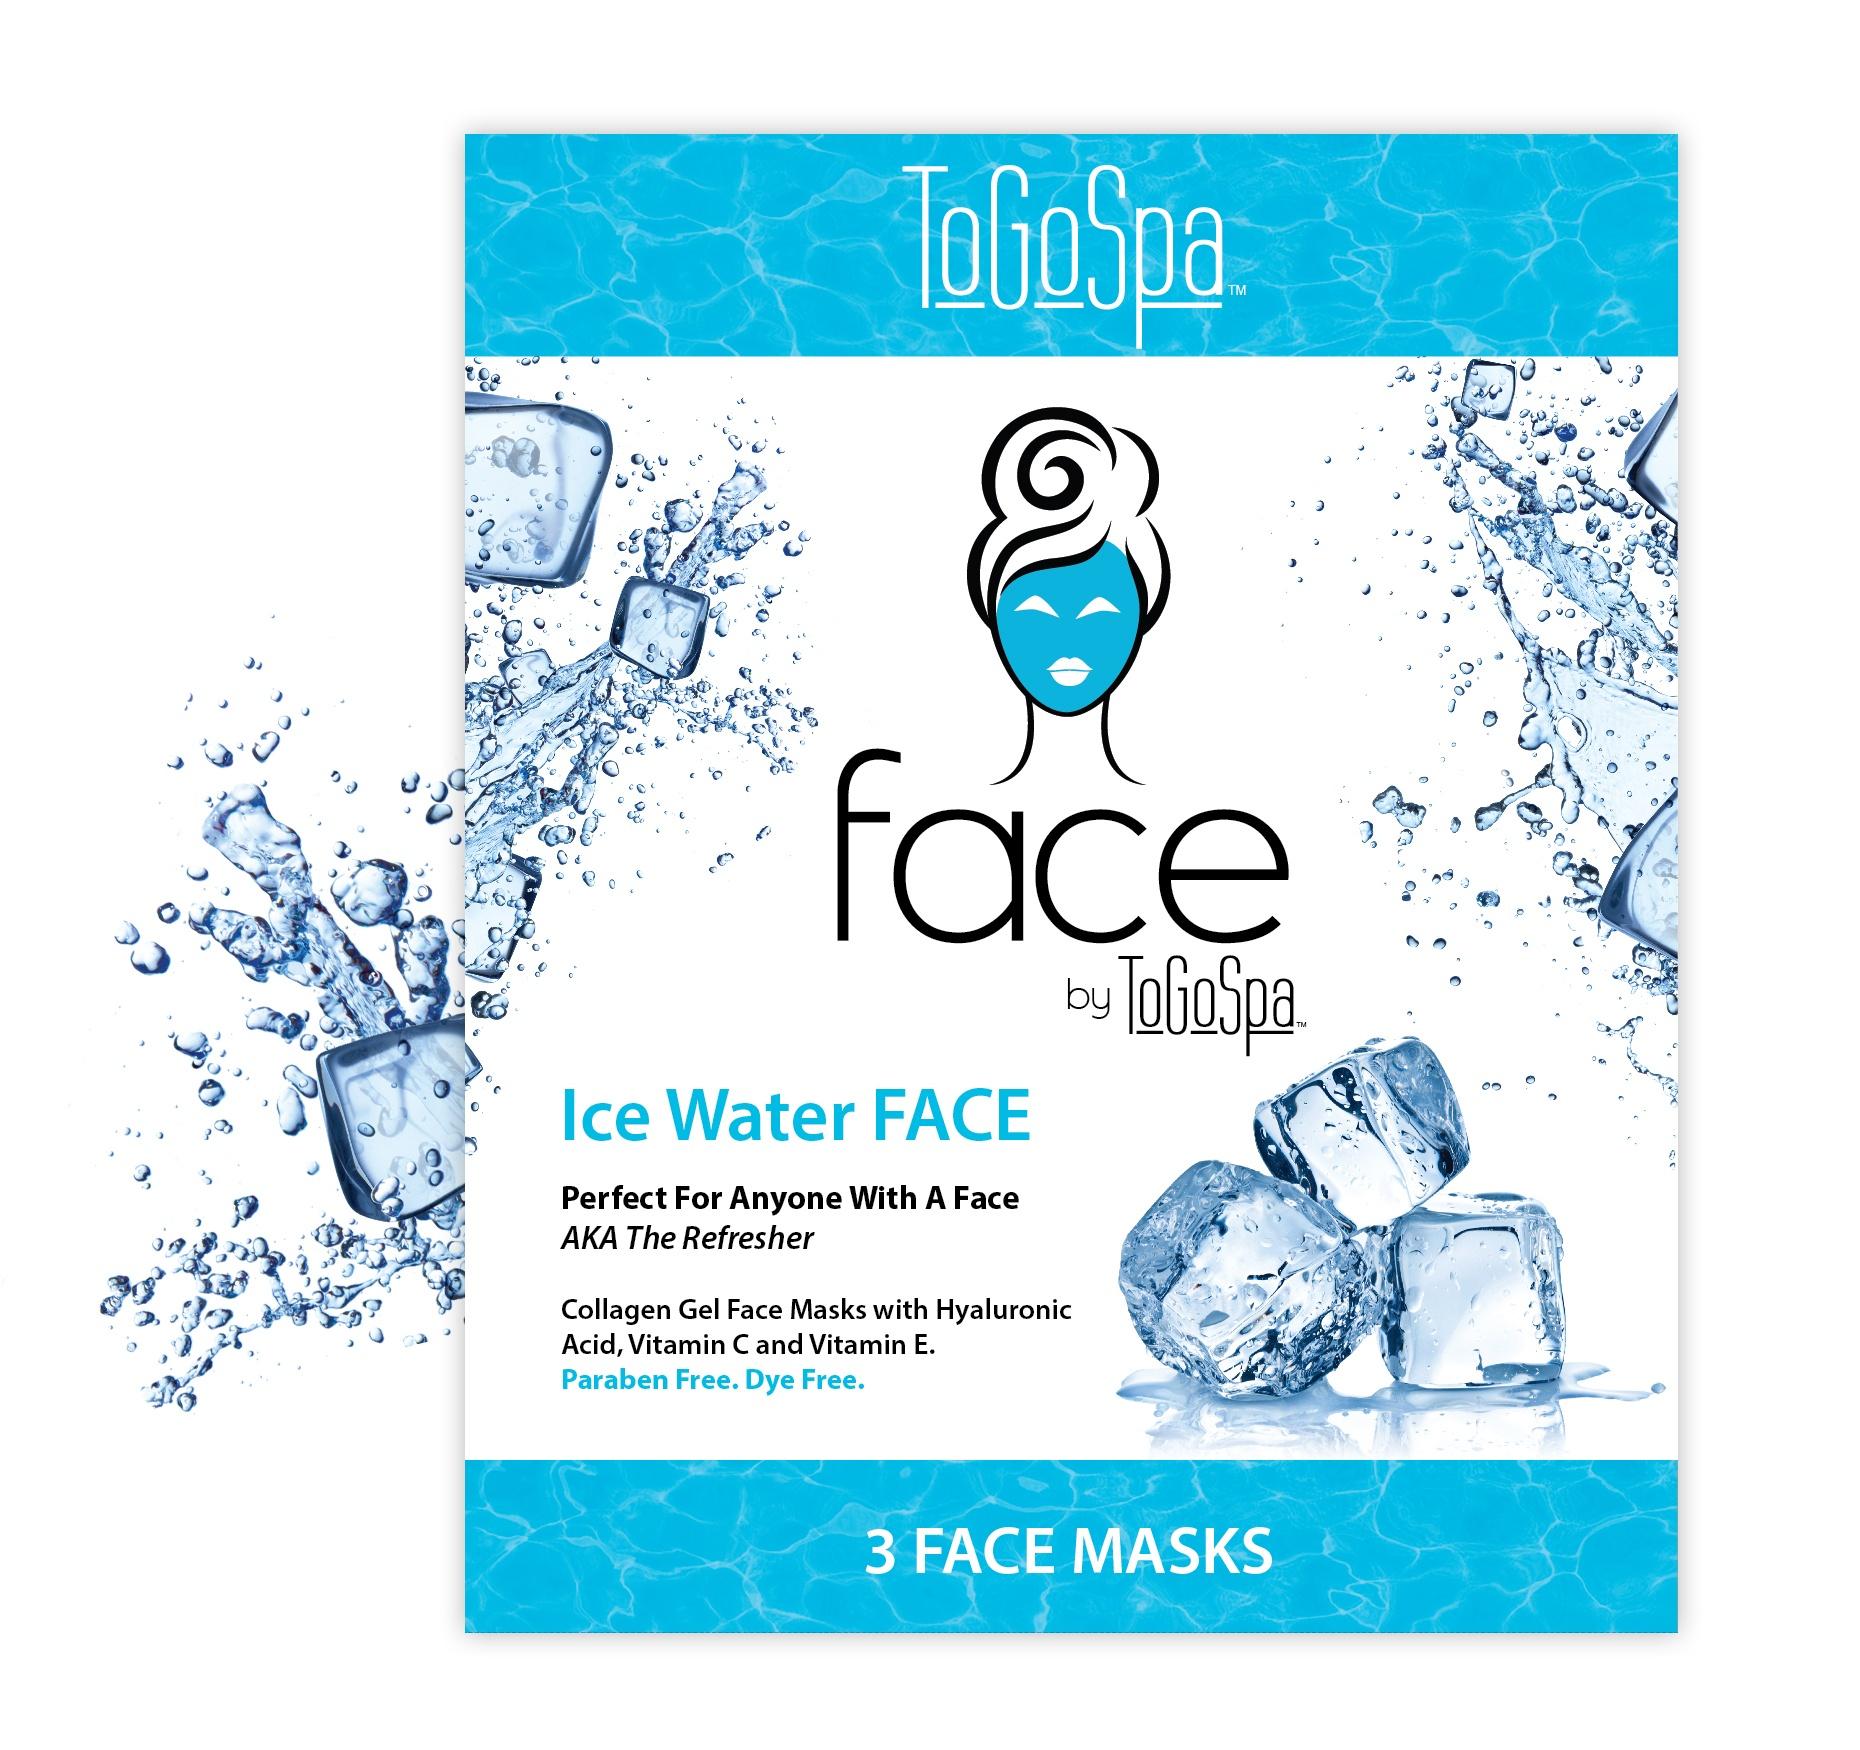 Ice_Water_FACE.jpg